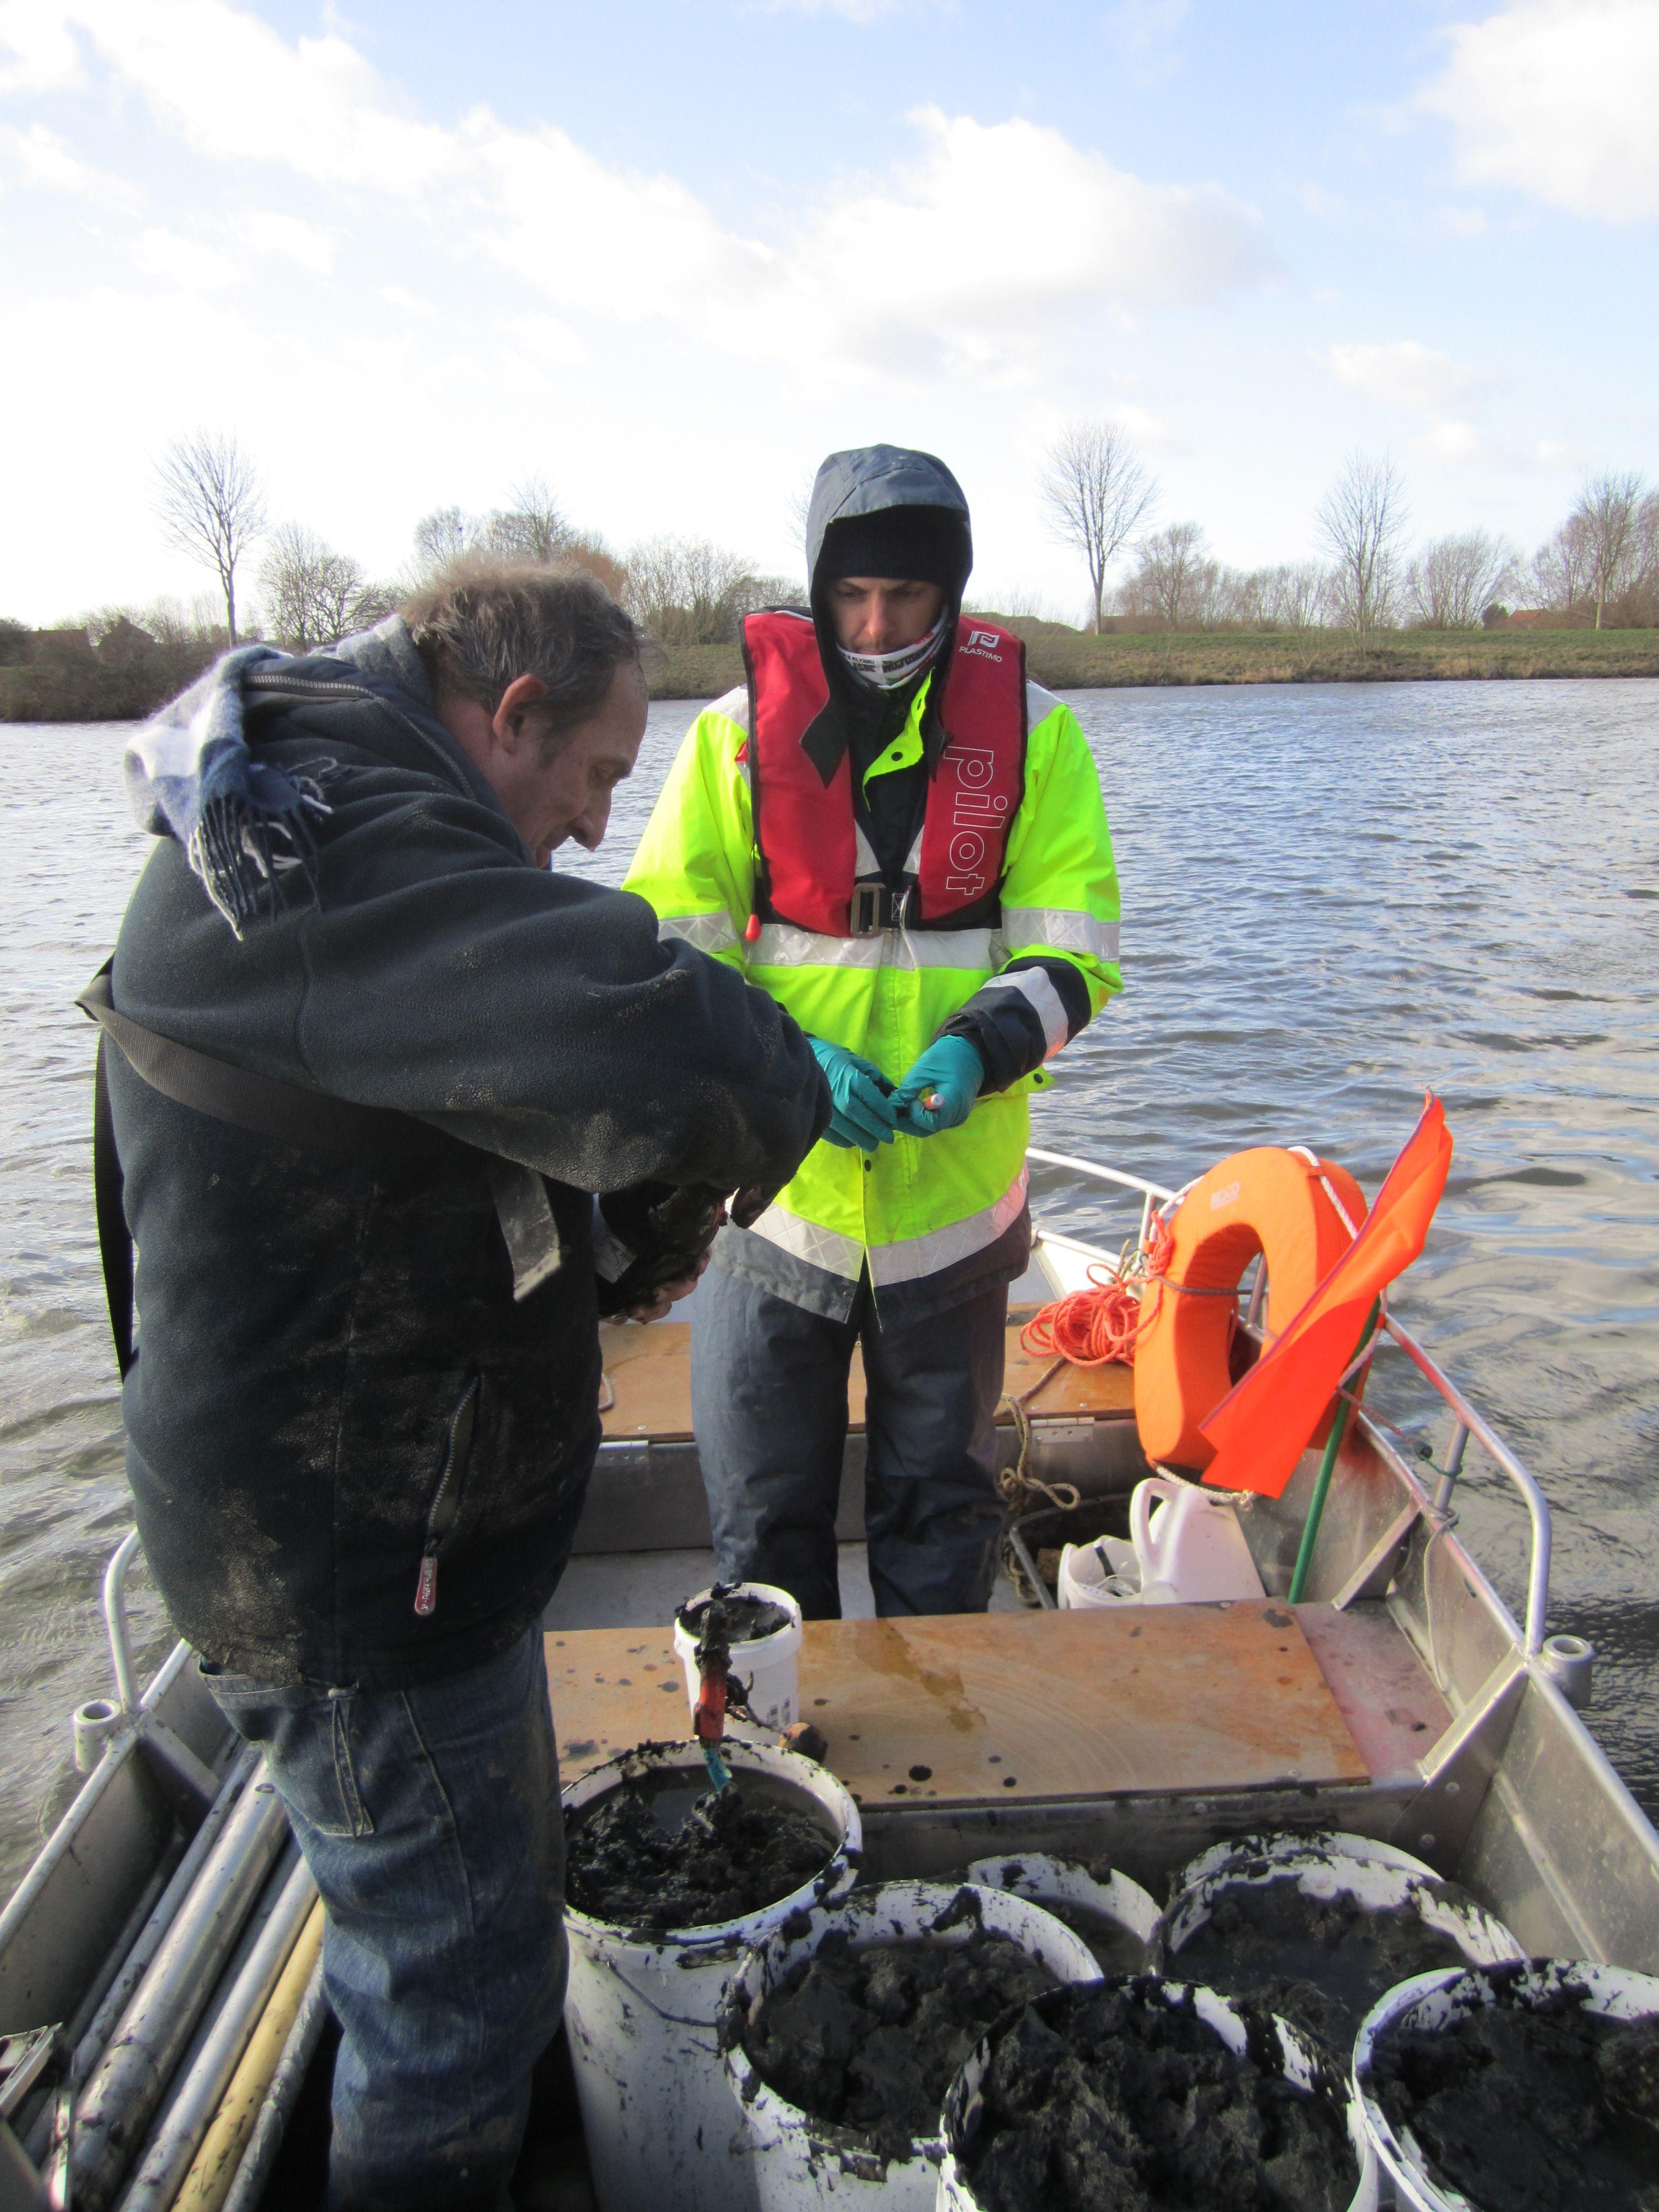 Barco de pesca de aluminio-depollution (3)